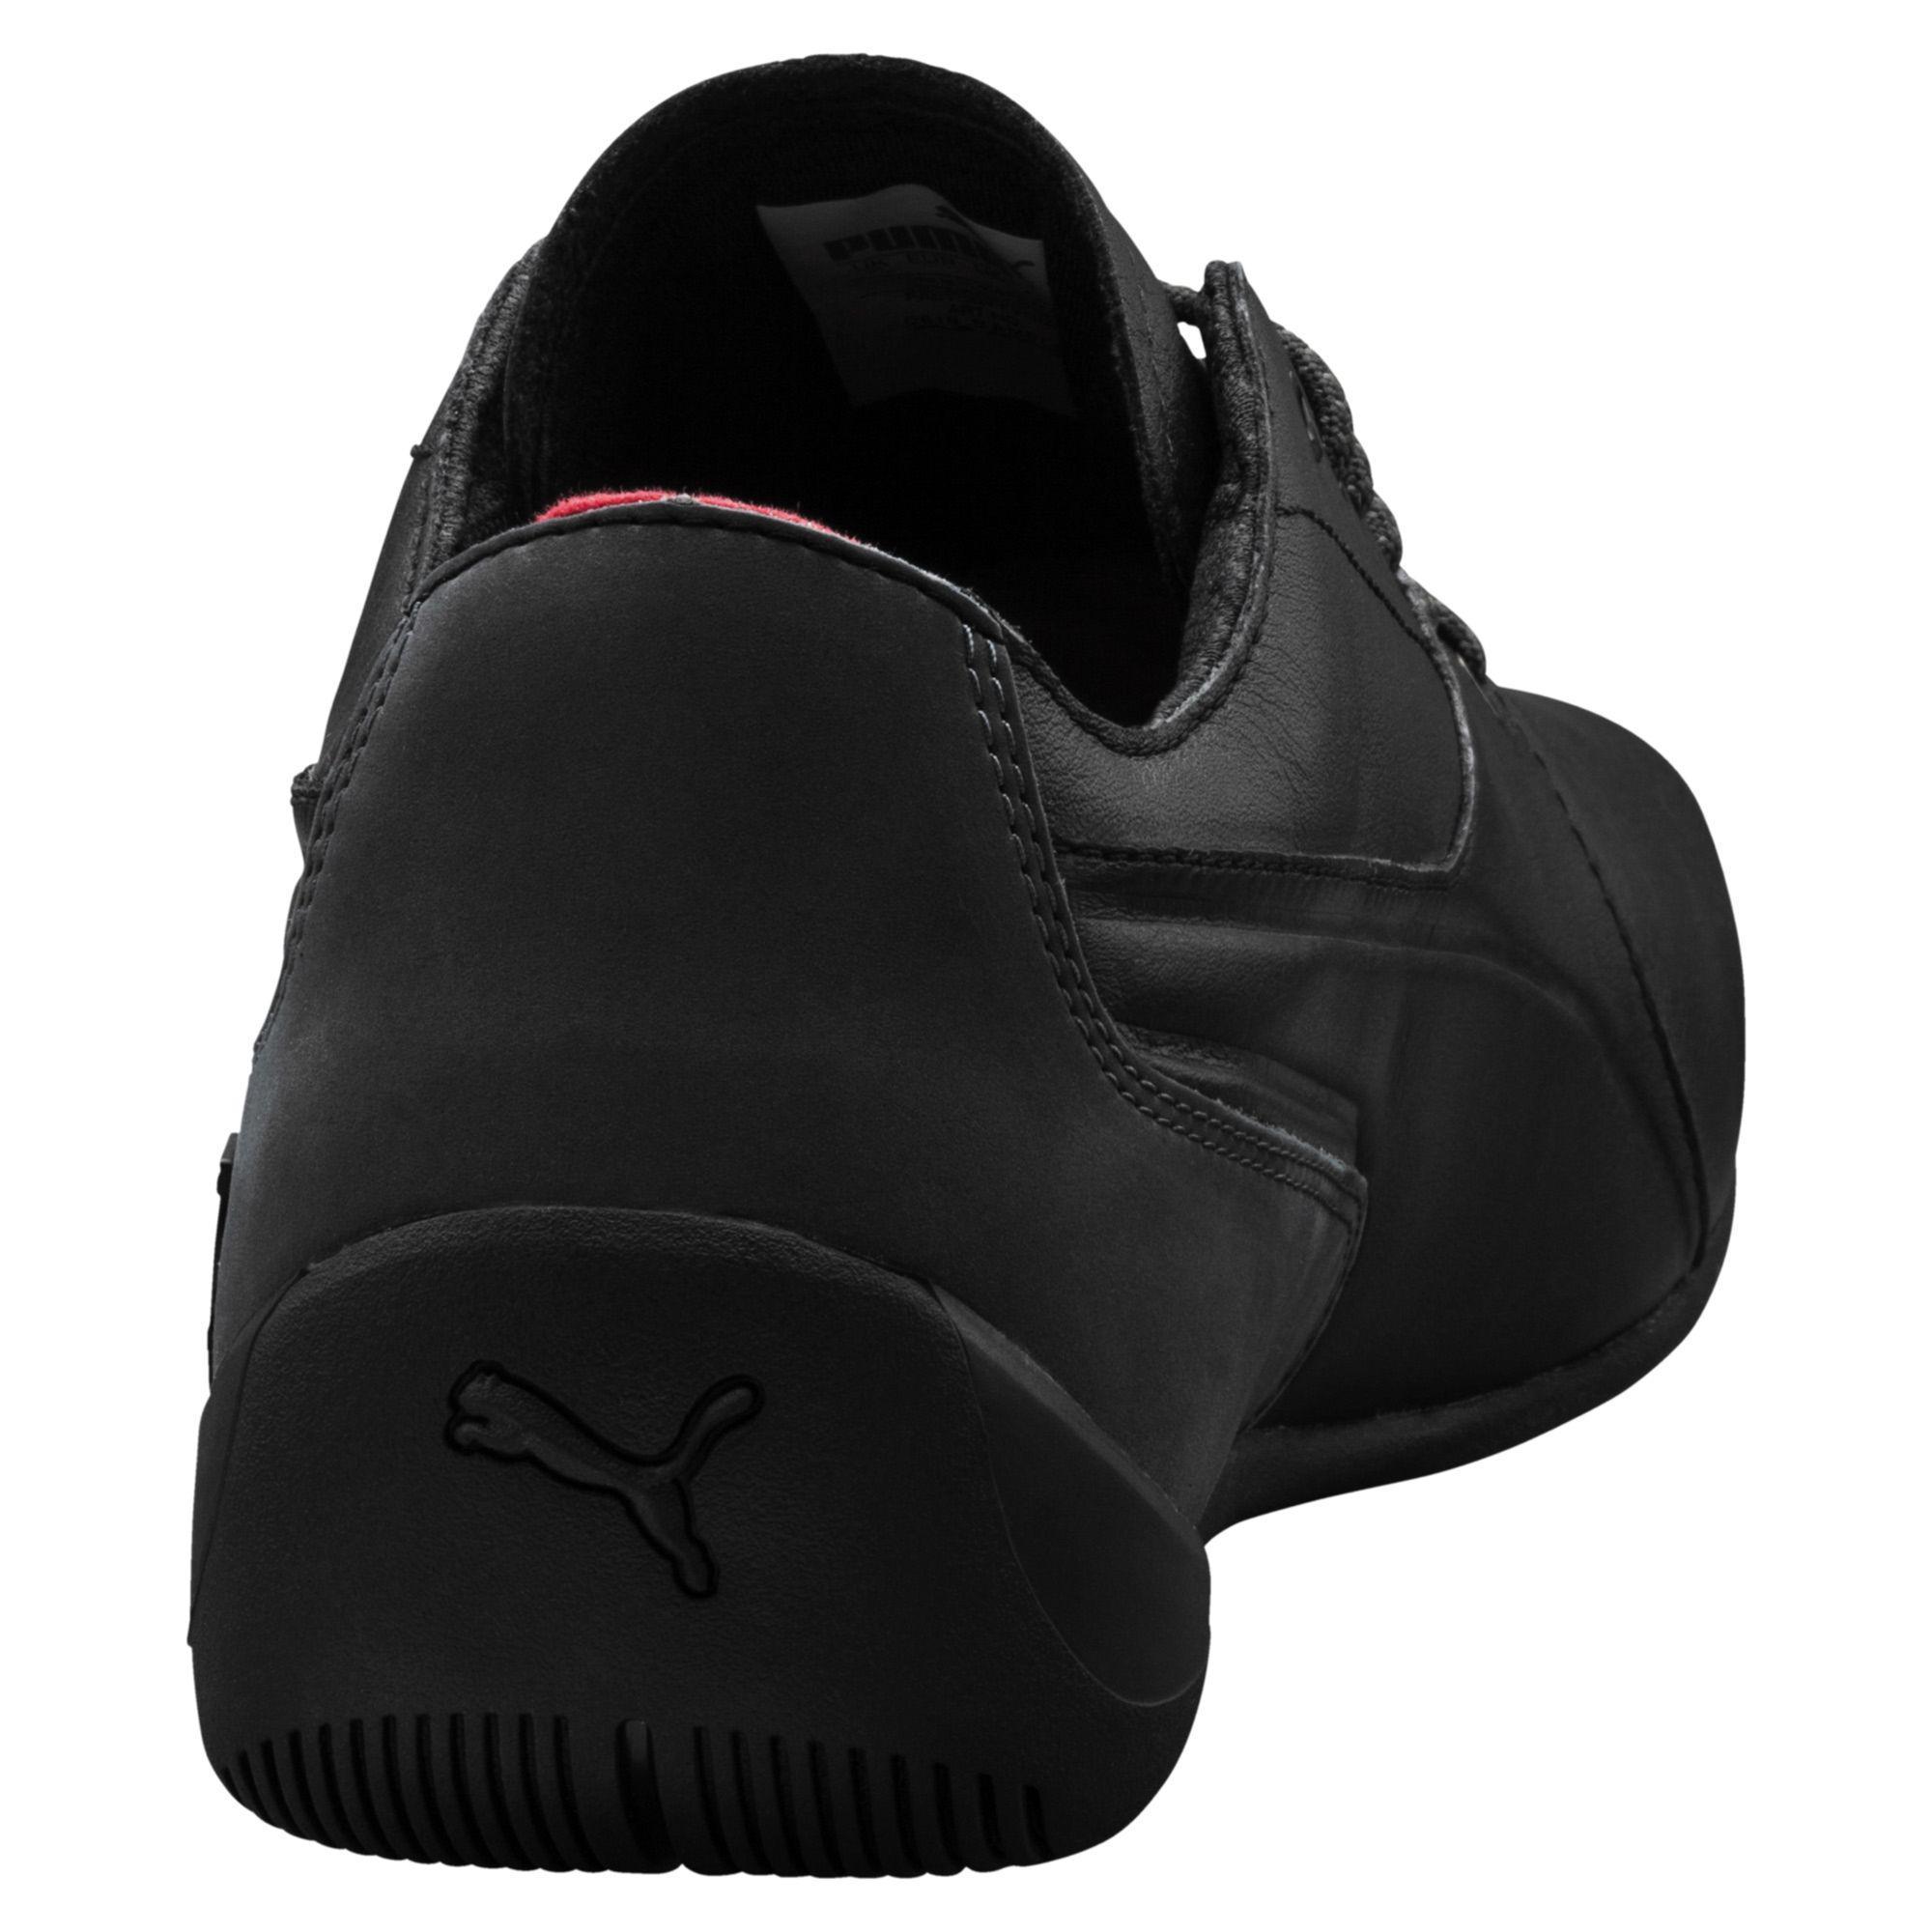 0997d28024203a Lyst - PUMA Ferrari Drift Cat 7 Lifestyle Men s Sneakers in Black ...